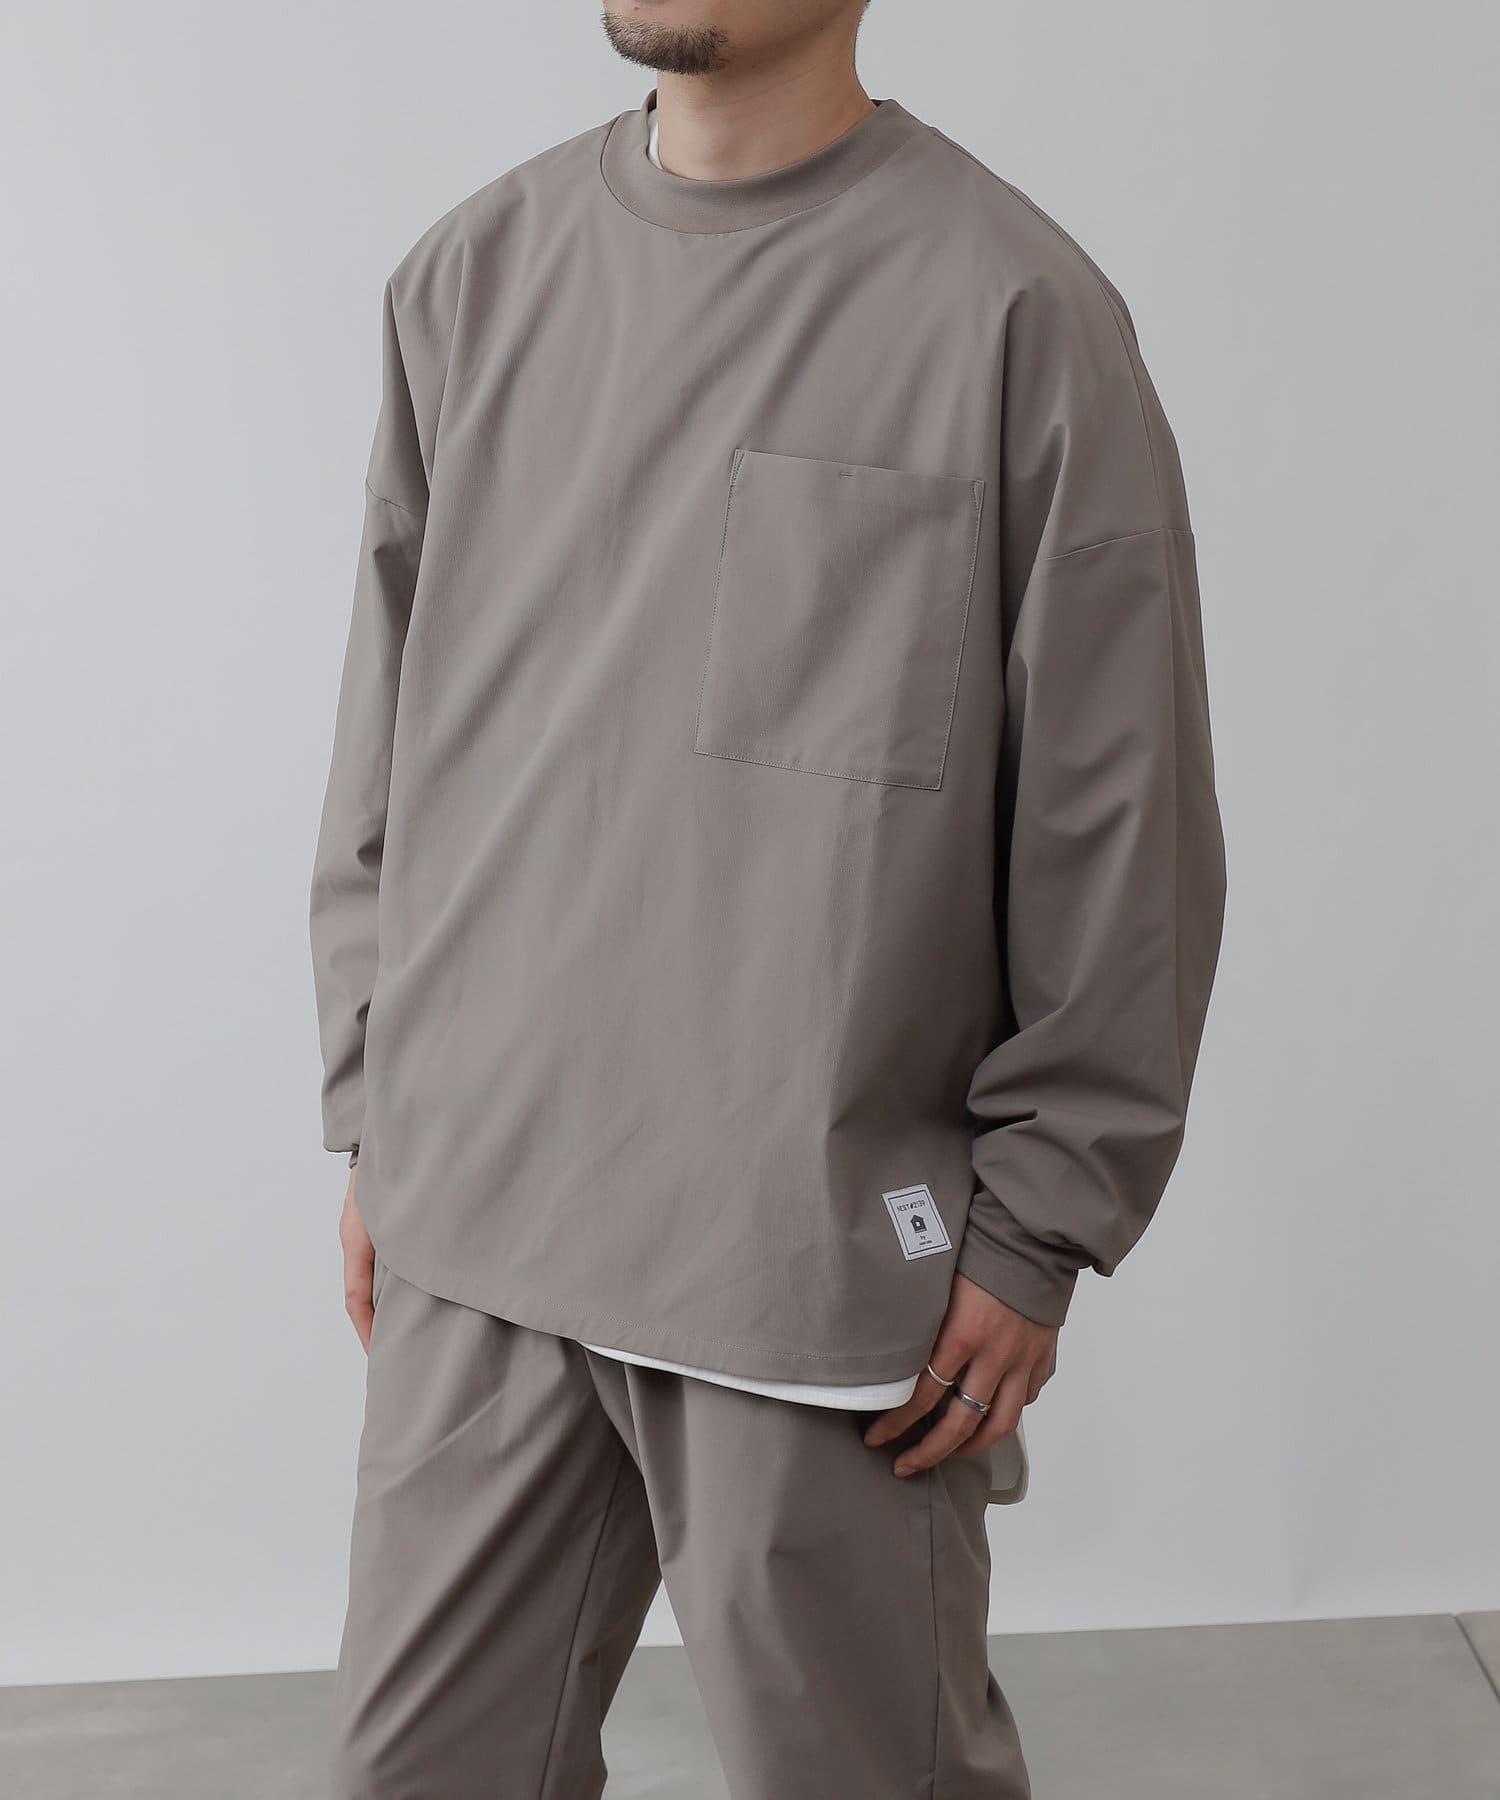 COLONY 2139(コロニー トゥーワンスリーナイン) NESTマルチストレッチ長袖Tシャツ/ロンT(セットアップ可)